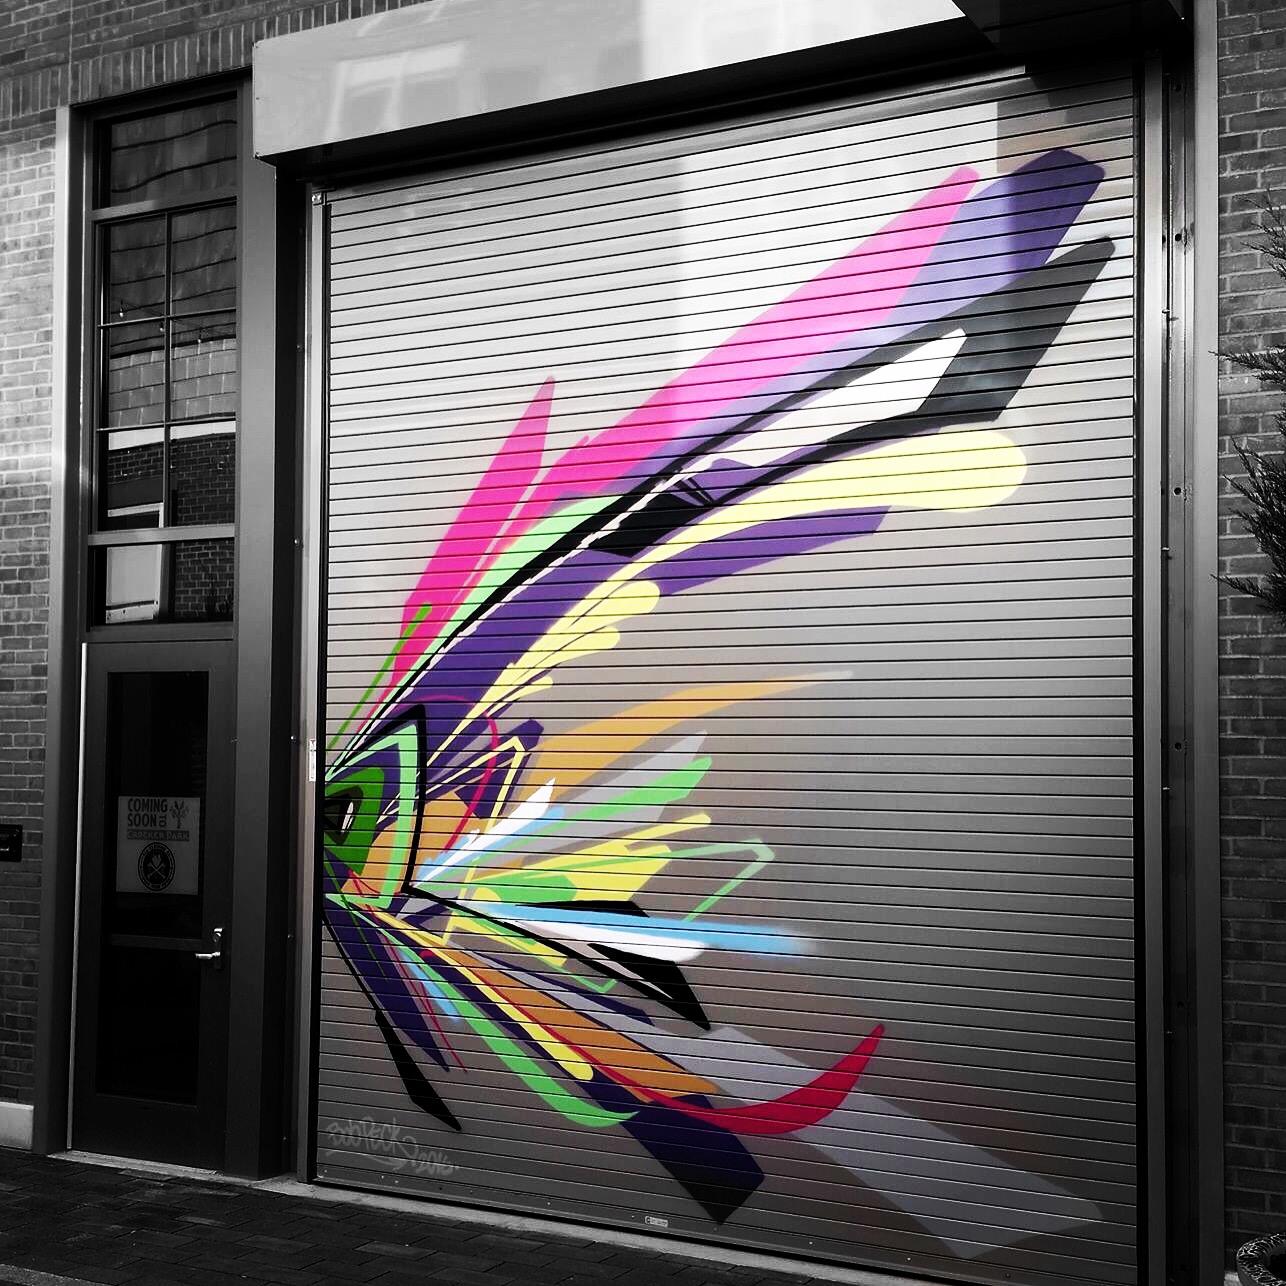 graffiti heart gives suburbs street cred graffiti heart. Black Bedroom Furniture Sets. Home Design Ideas